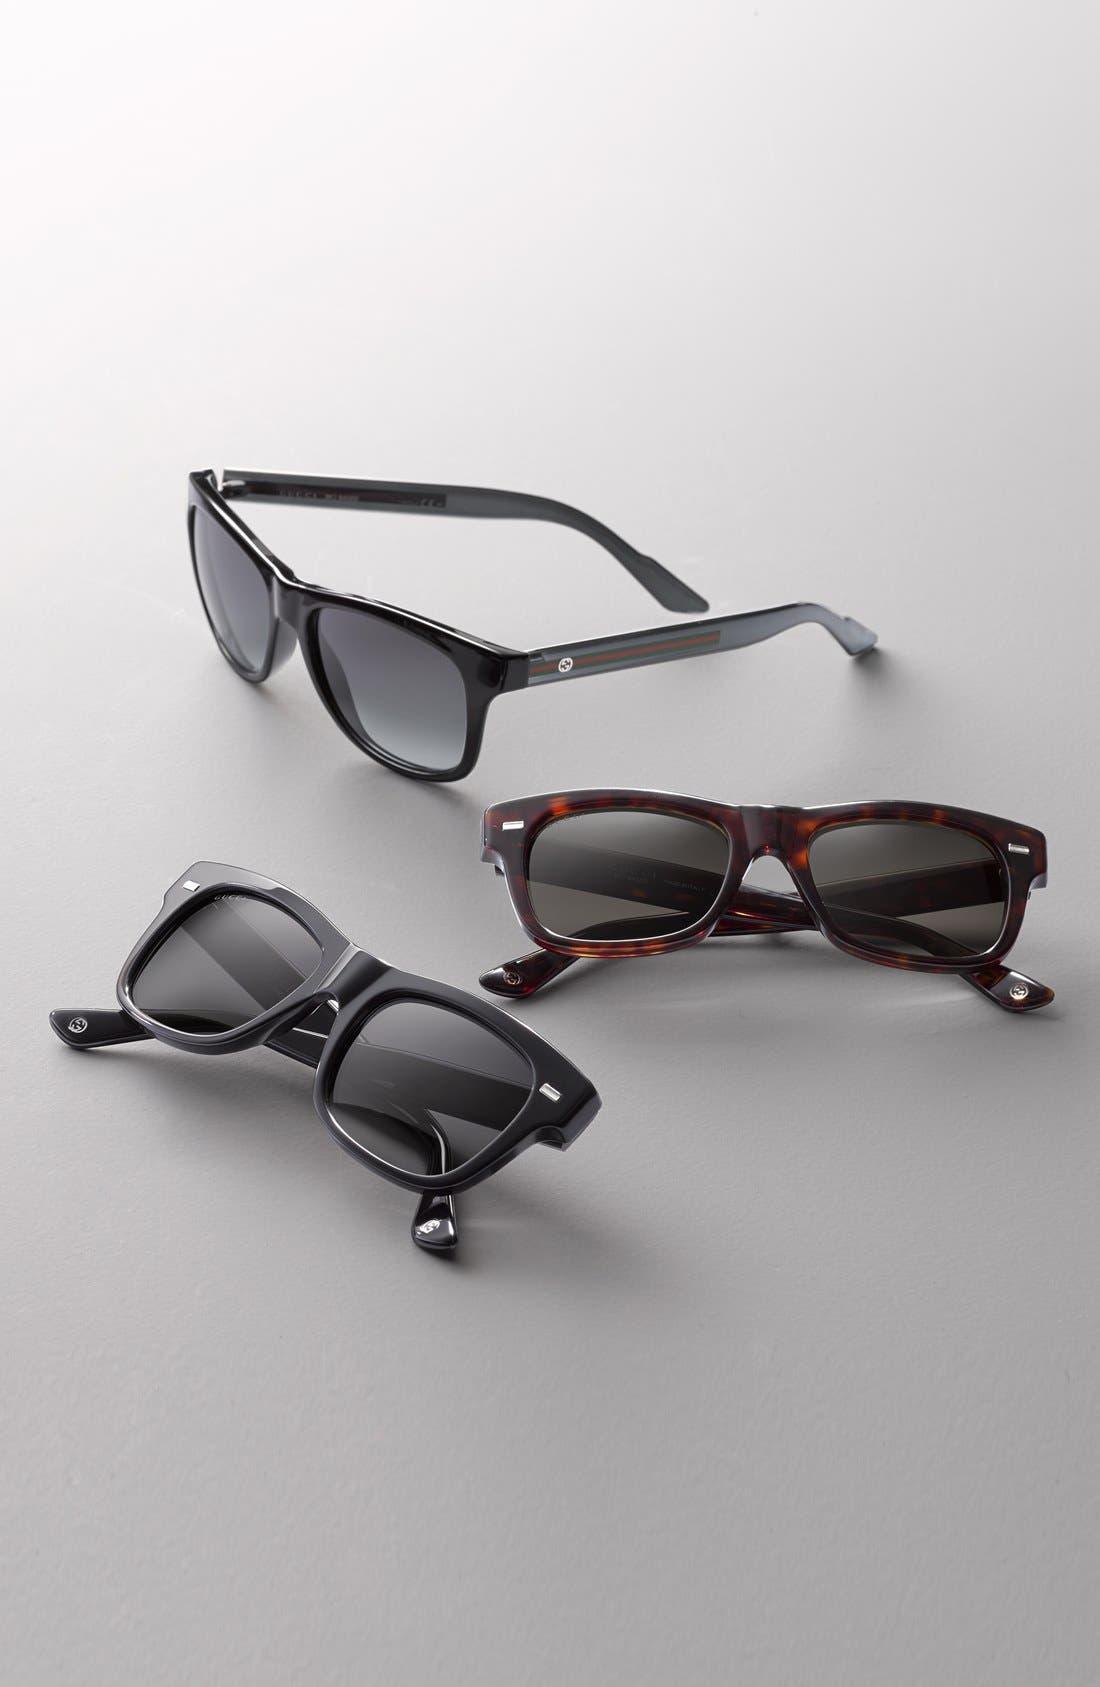 57mm Bio Based Sunglasses,                             Main thumbnail 1, color,                             001